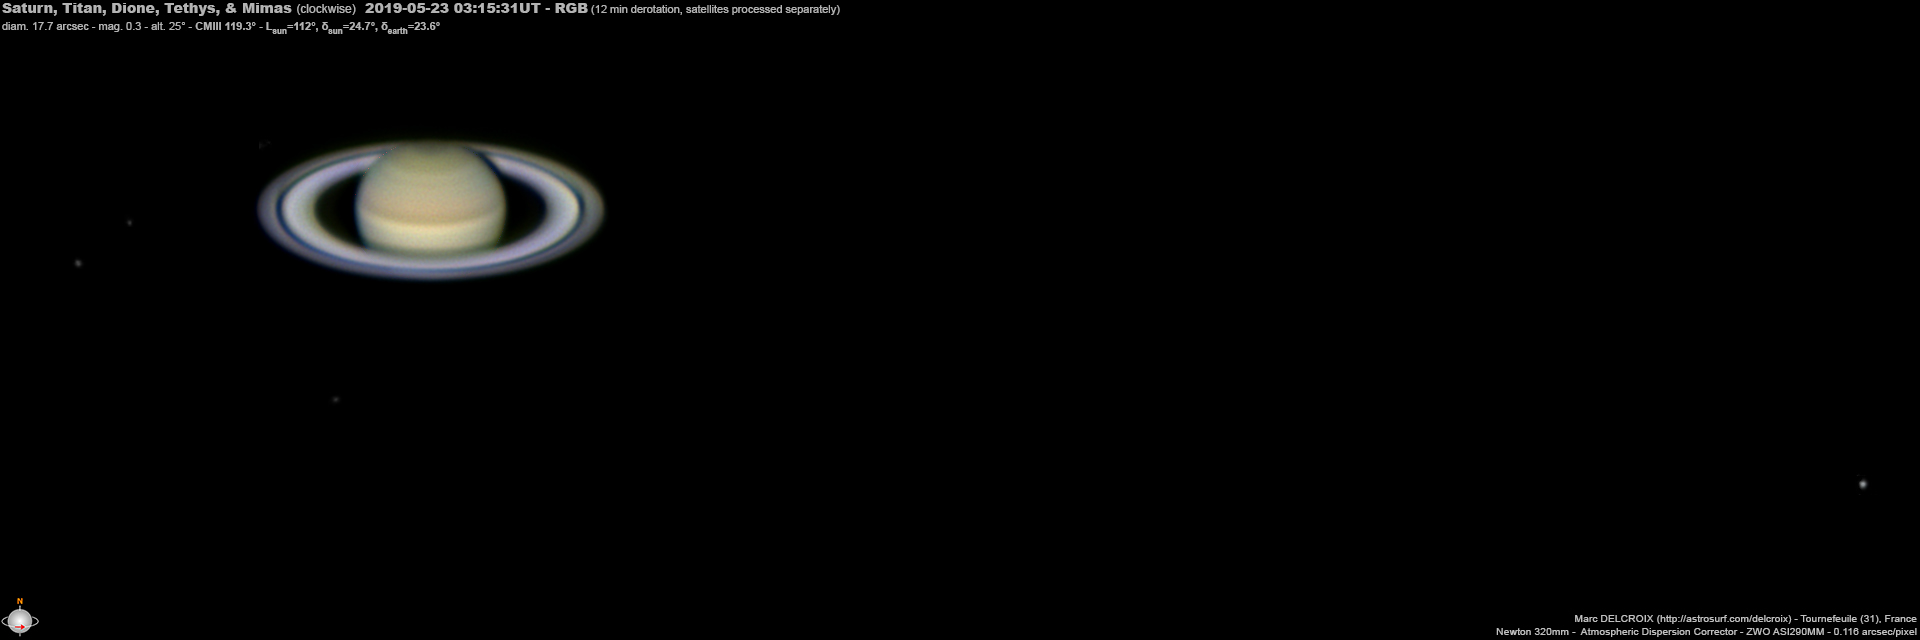 s2019-05-23_03-15-18_rgb_md.jpg